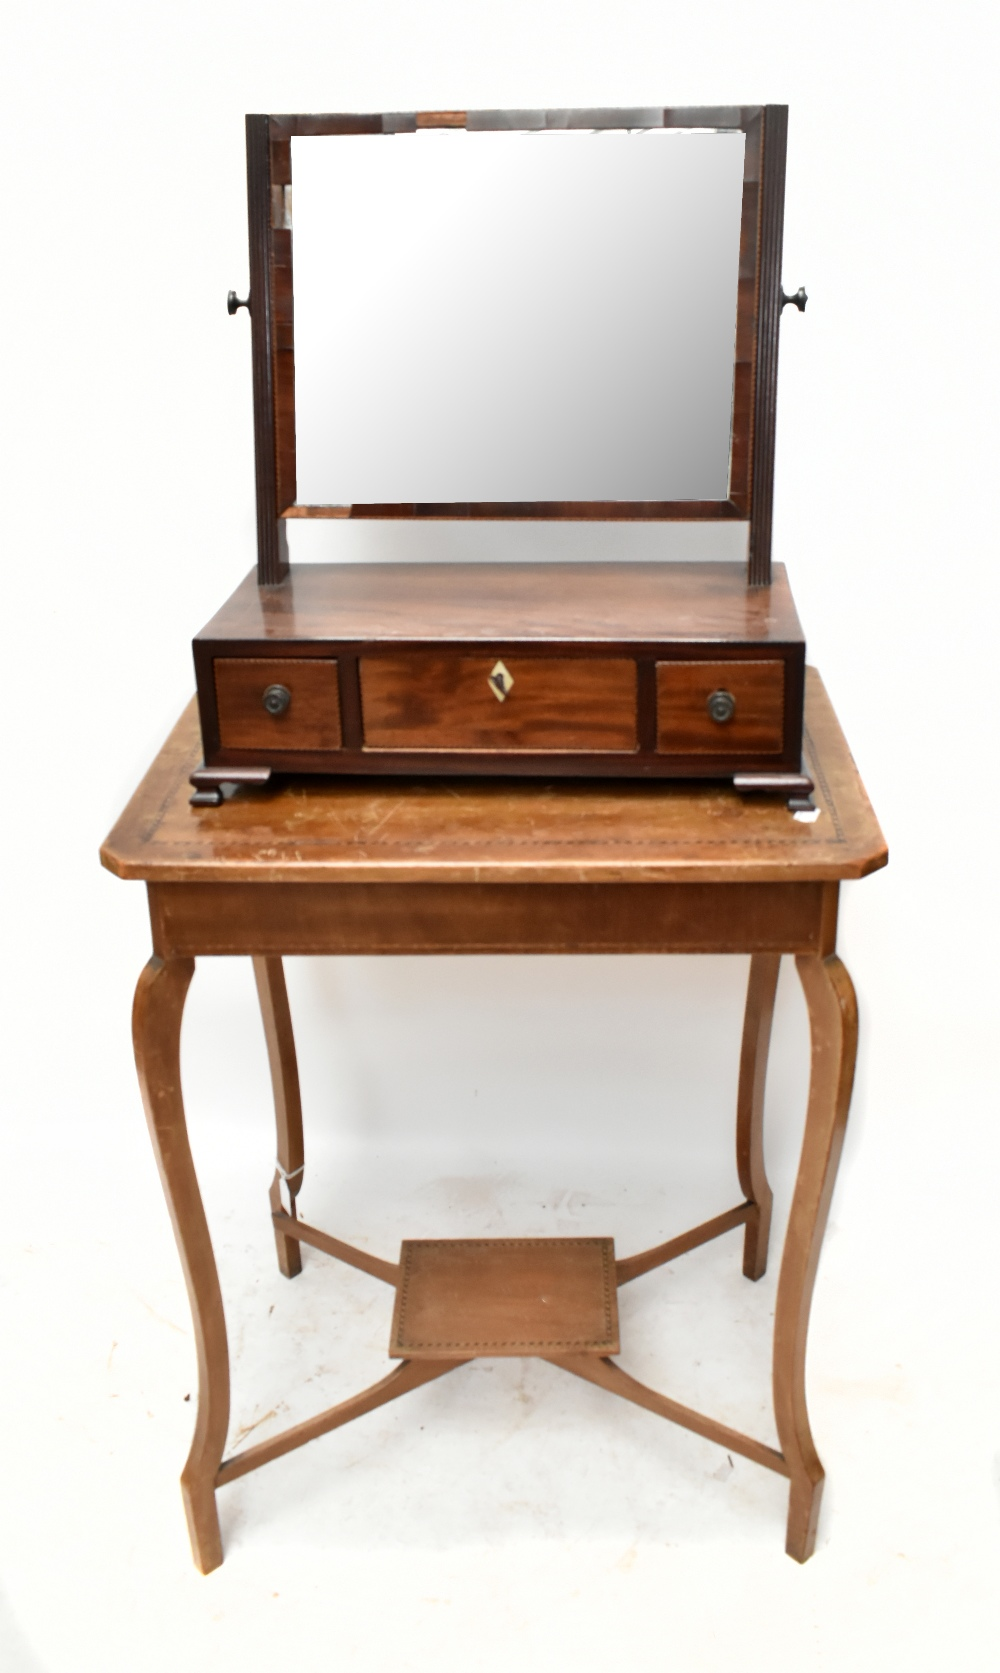 A 19th century mahogany dressing table mirror with three base drawers, raised on bracket feet,